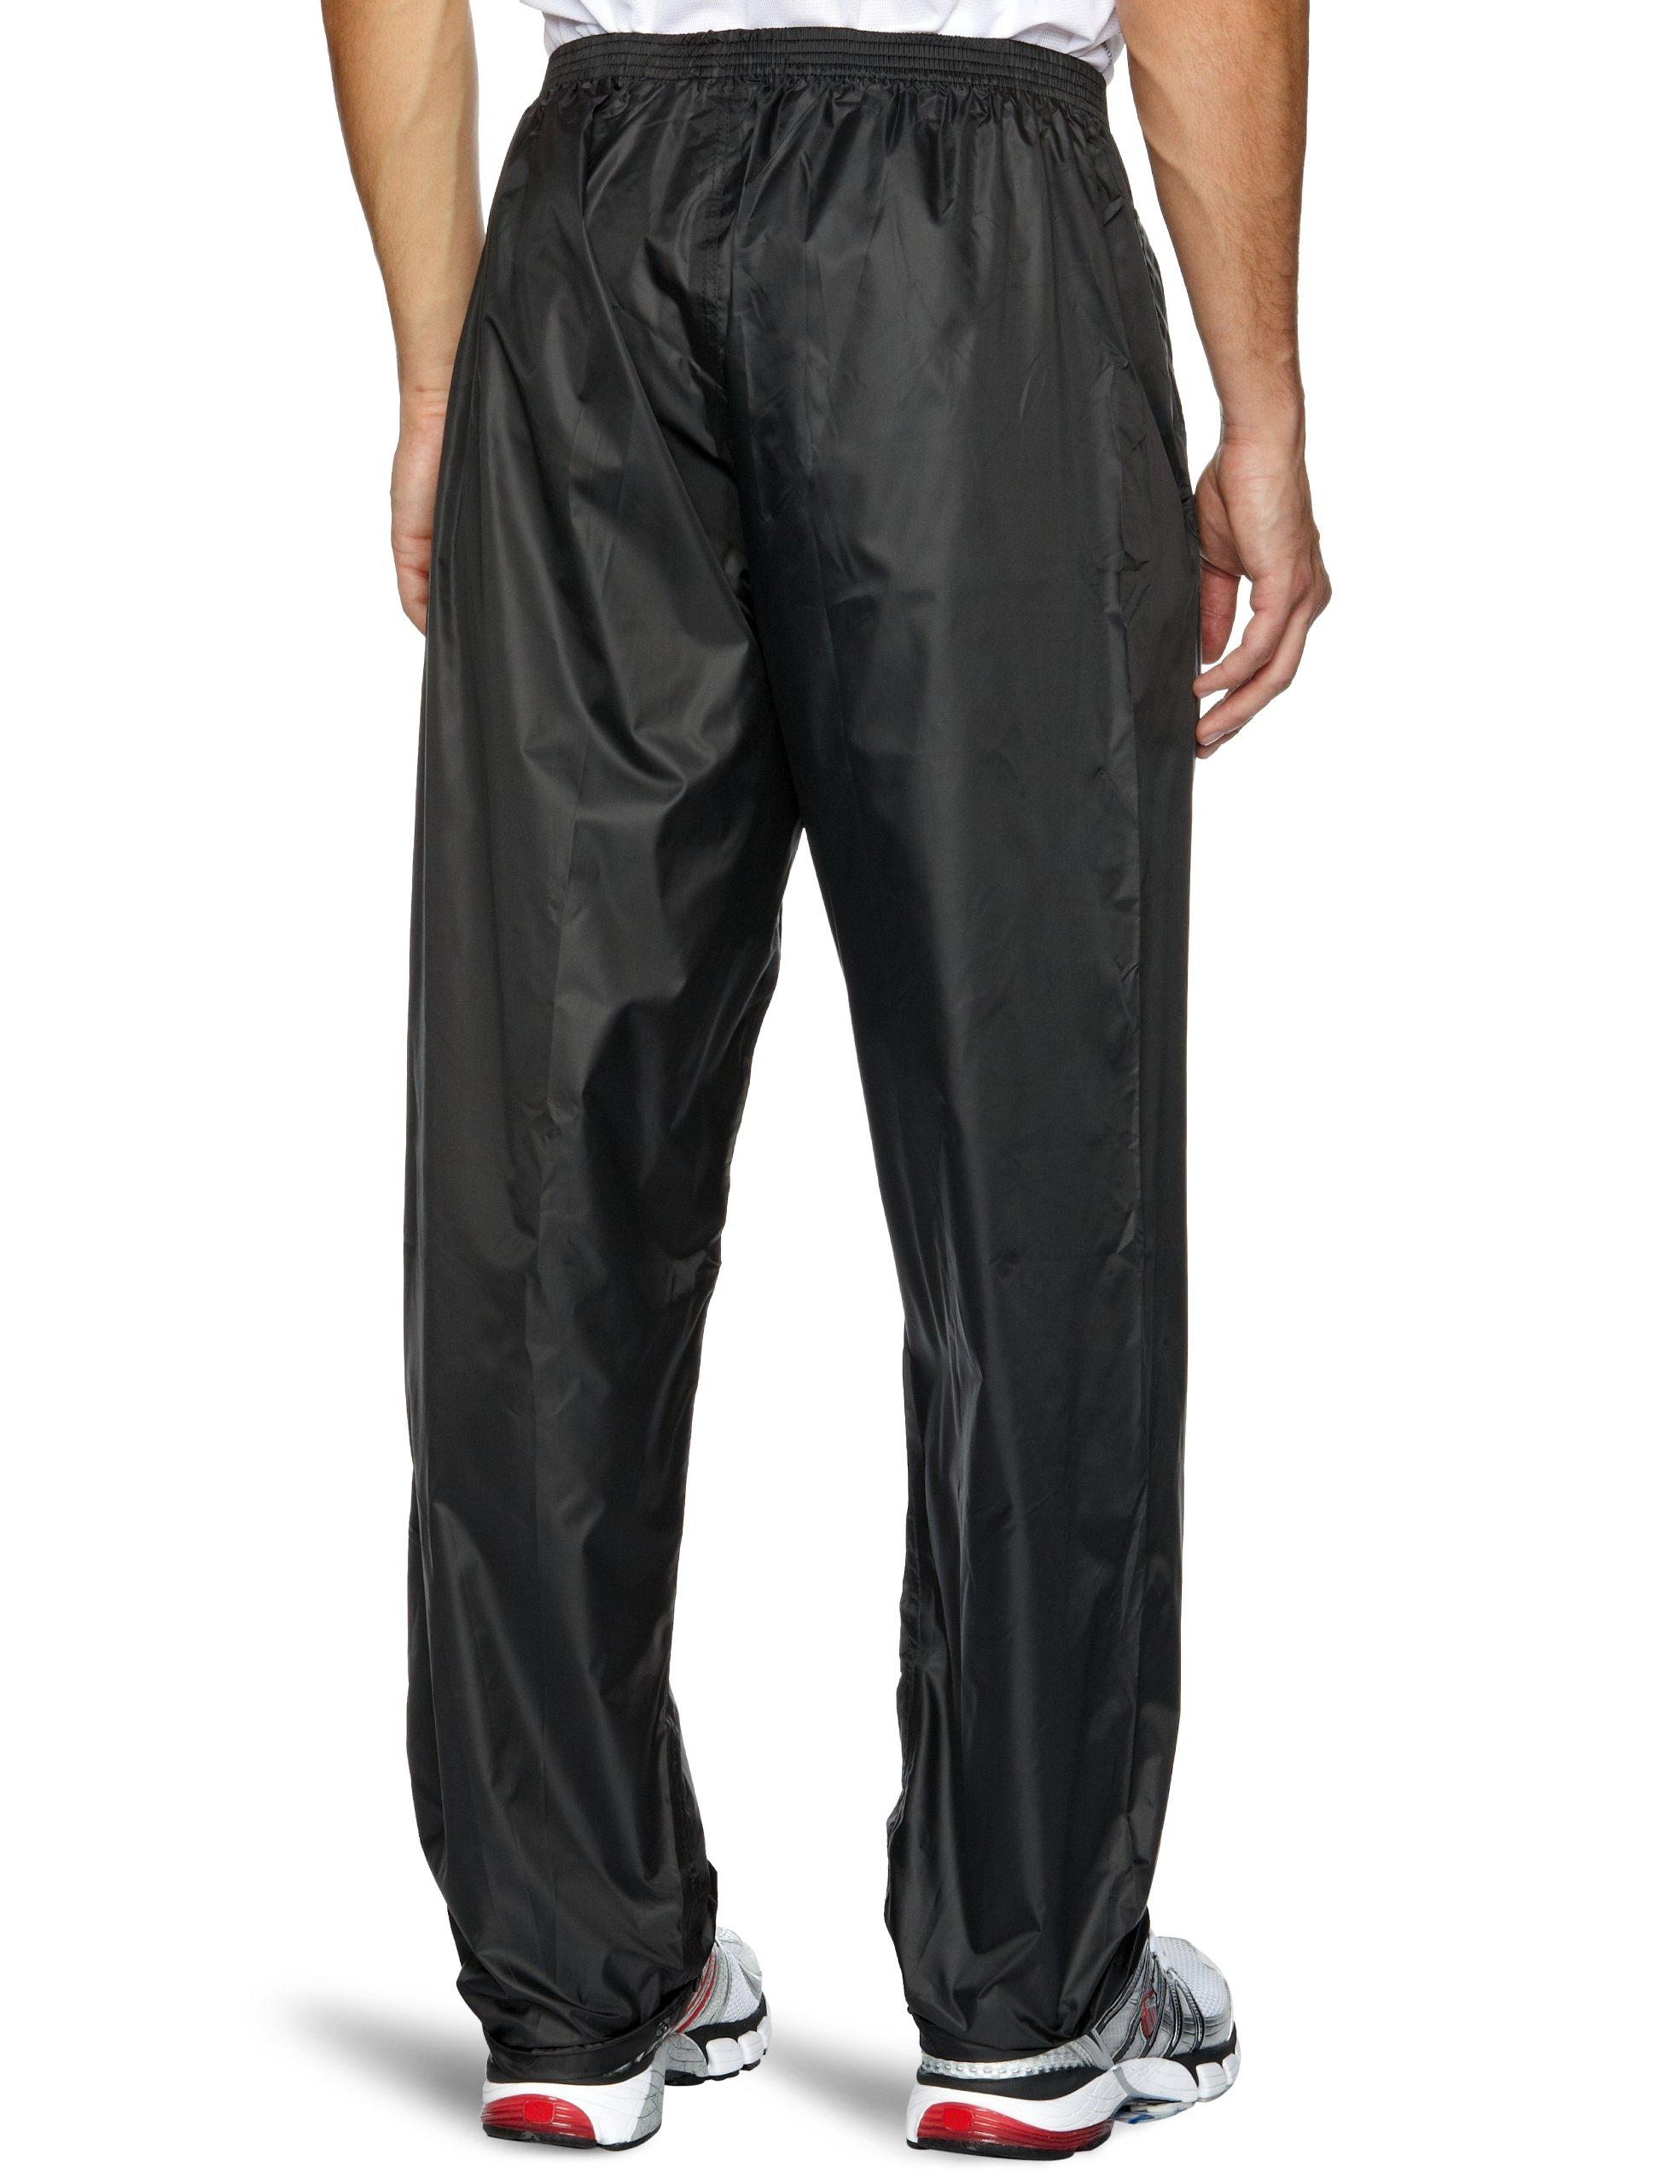 813tUDNnANL - Regatta Packaway II Men's Leisurewear OverTrouser